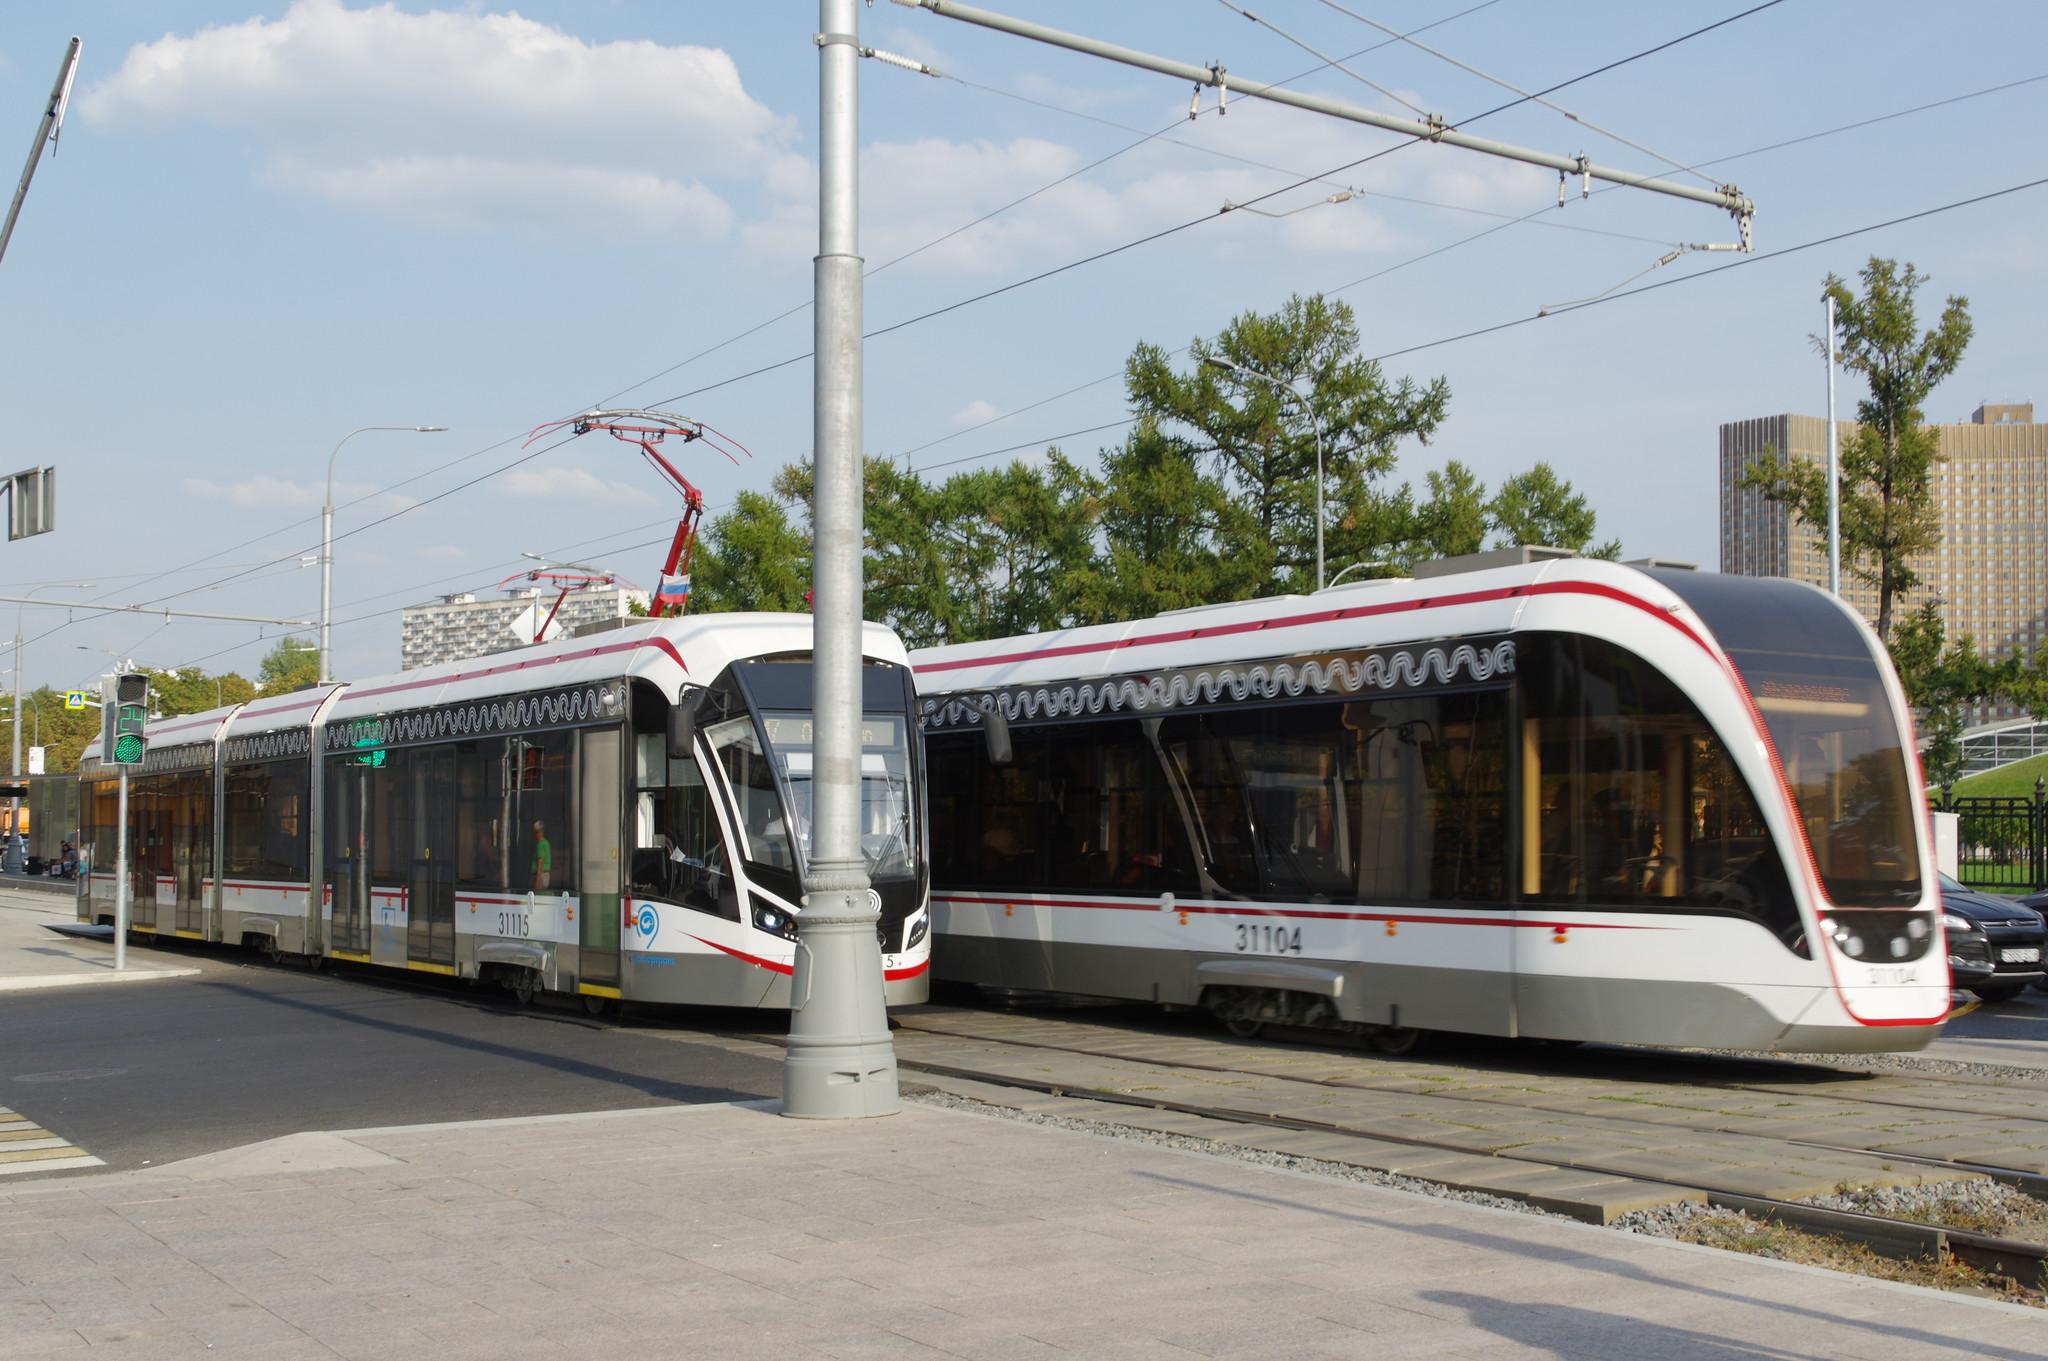 Трёхсекционные трамваи 71-931М «Витязь-М» на маршруте № 17